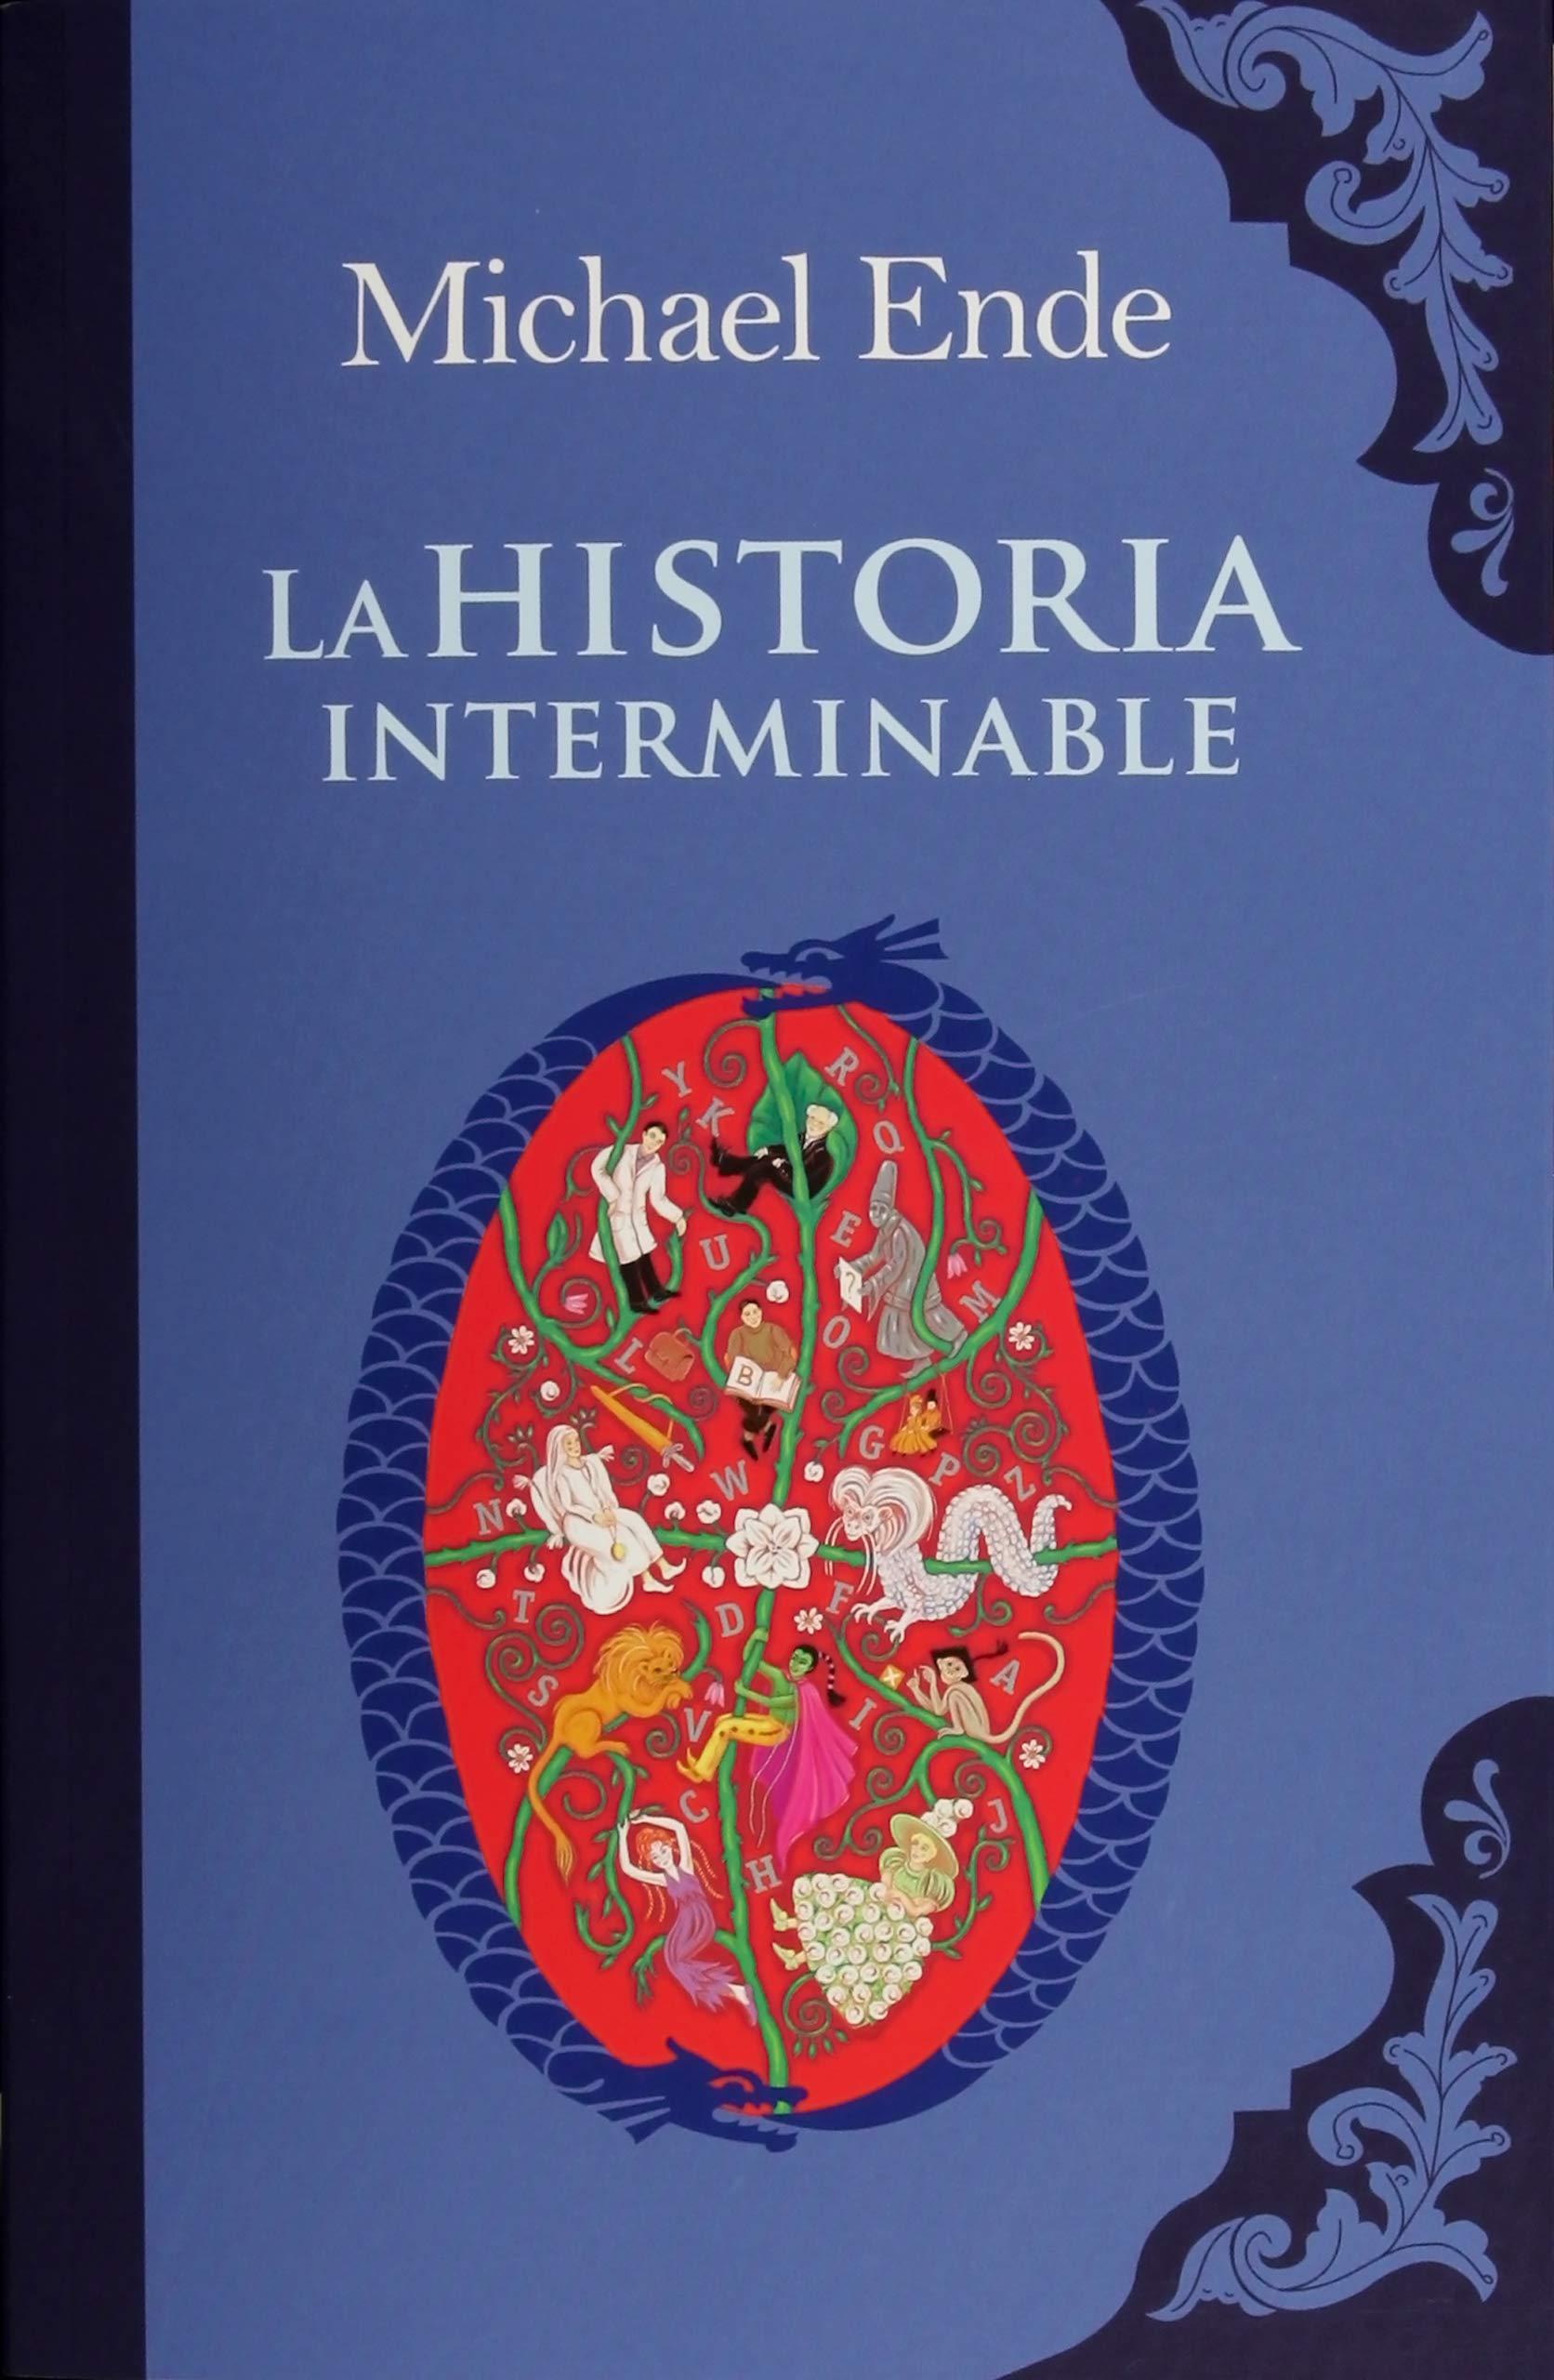 La historia interminable: Michael Ende: Amazon.com.mx: Libros